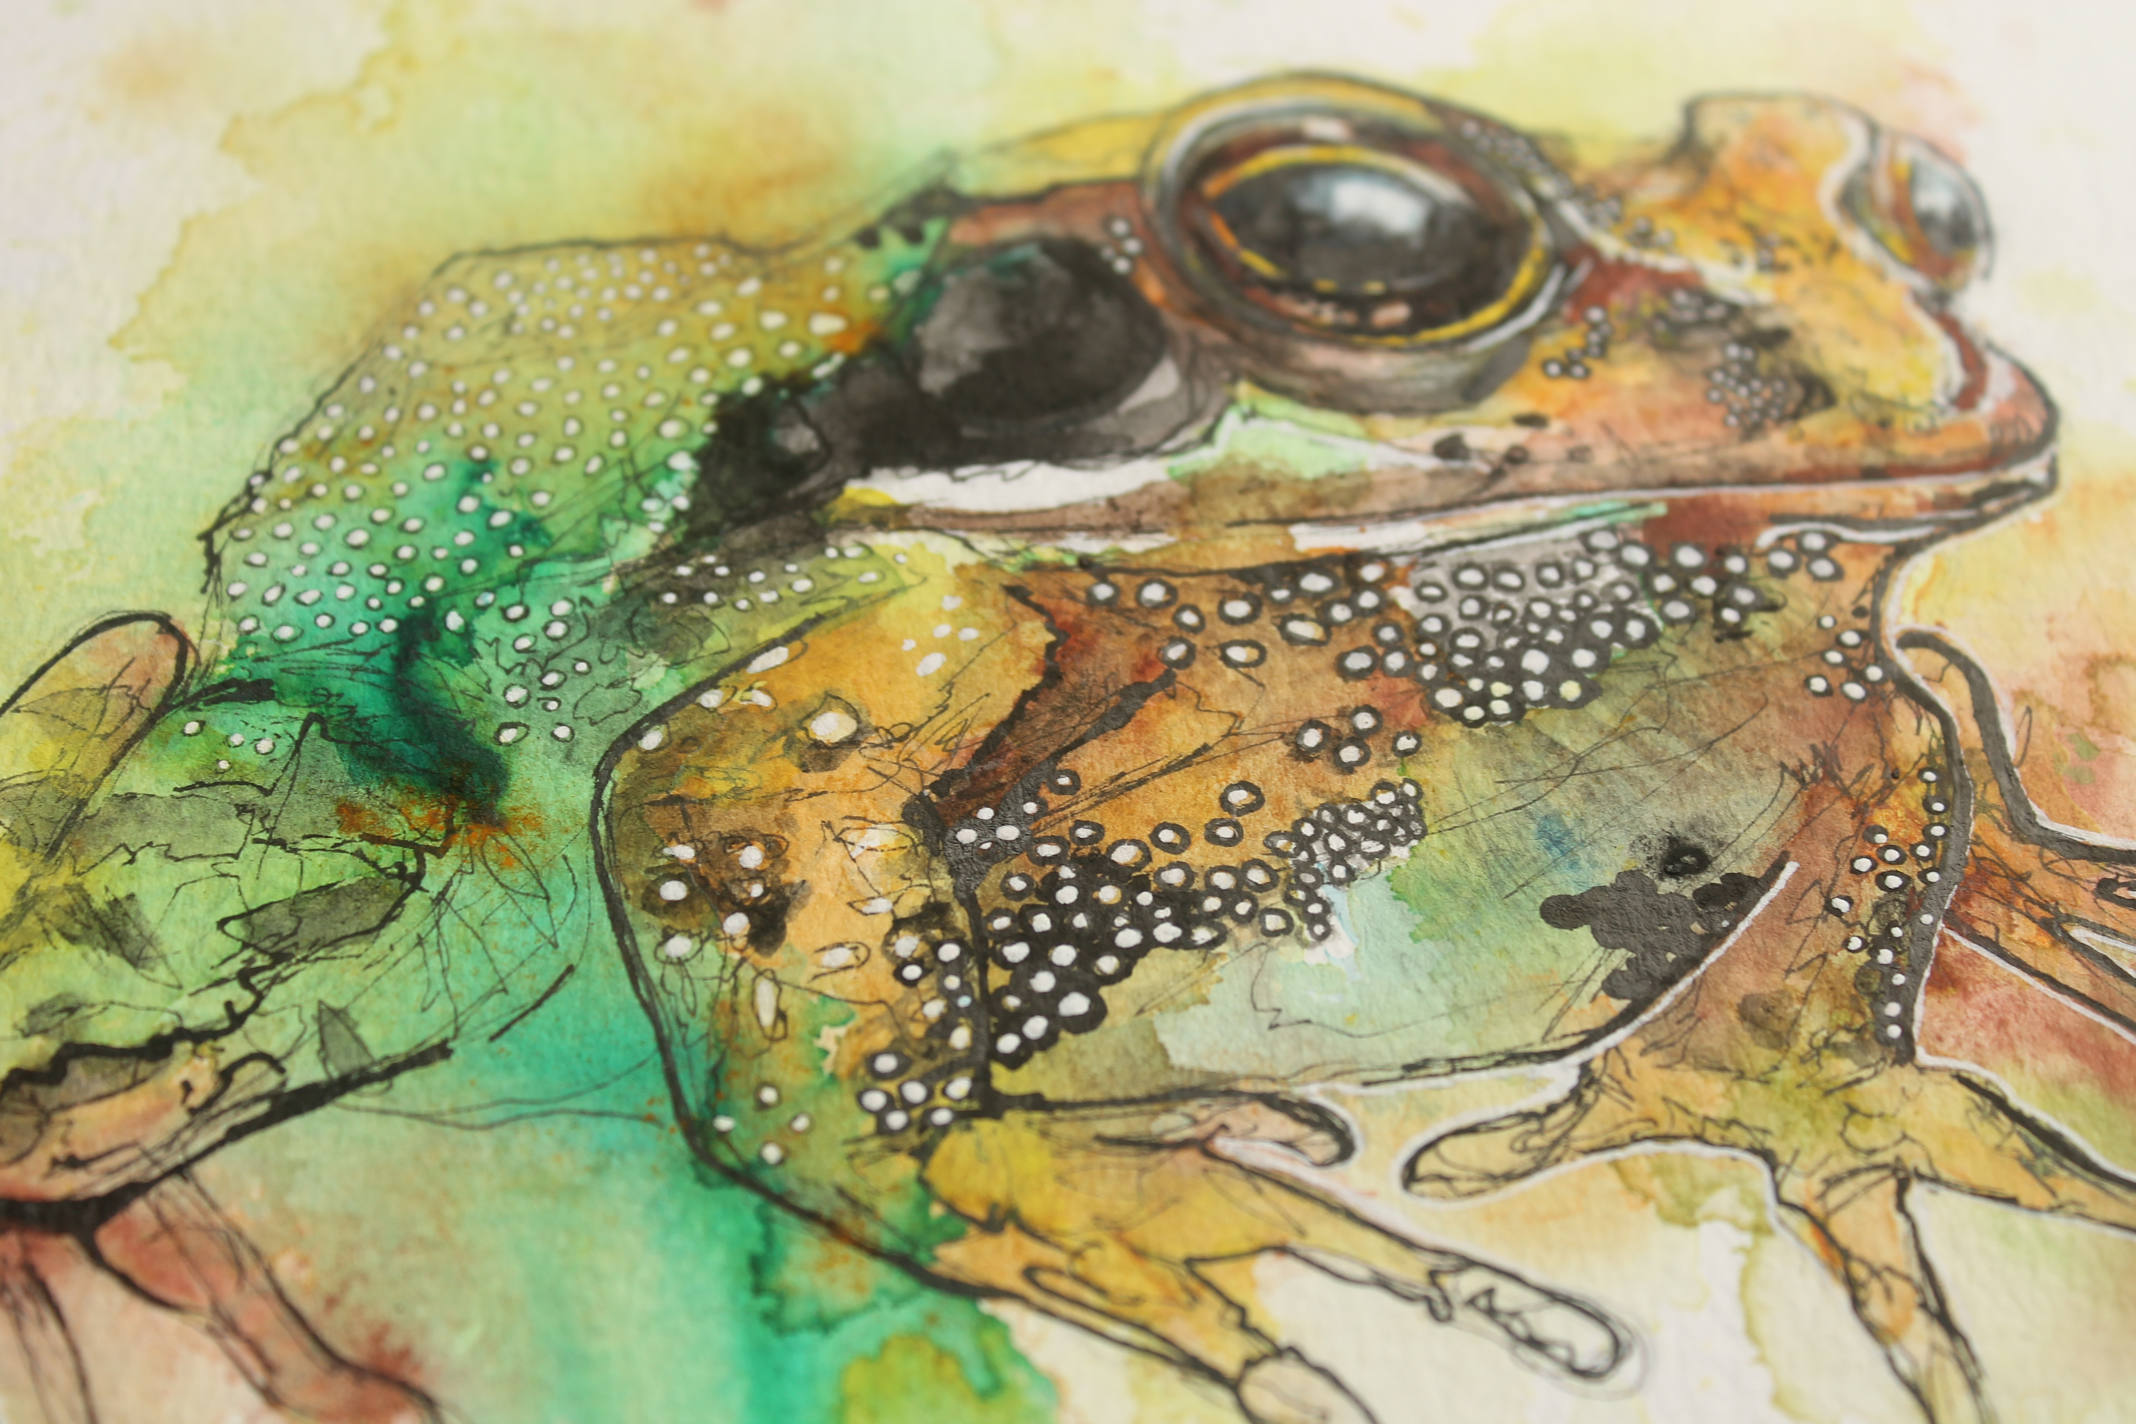 toad-pose-2.jpg